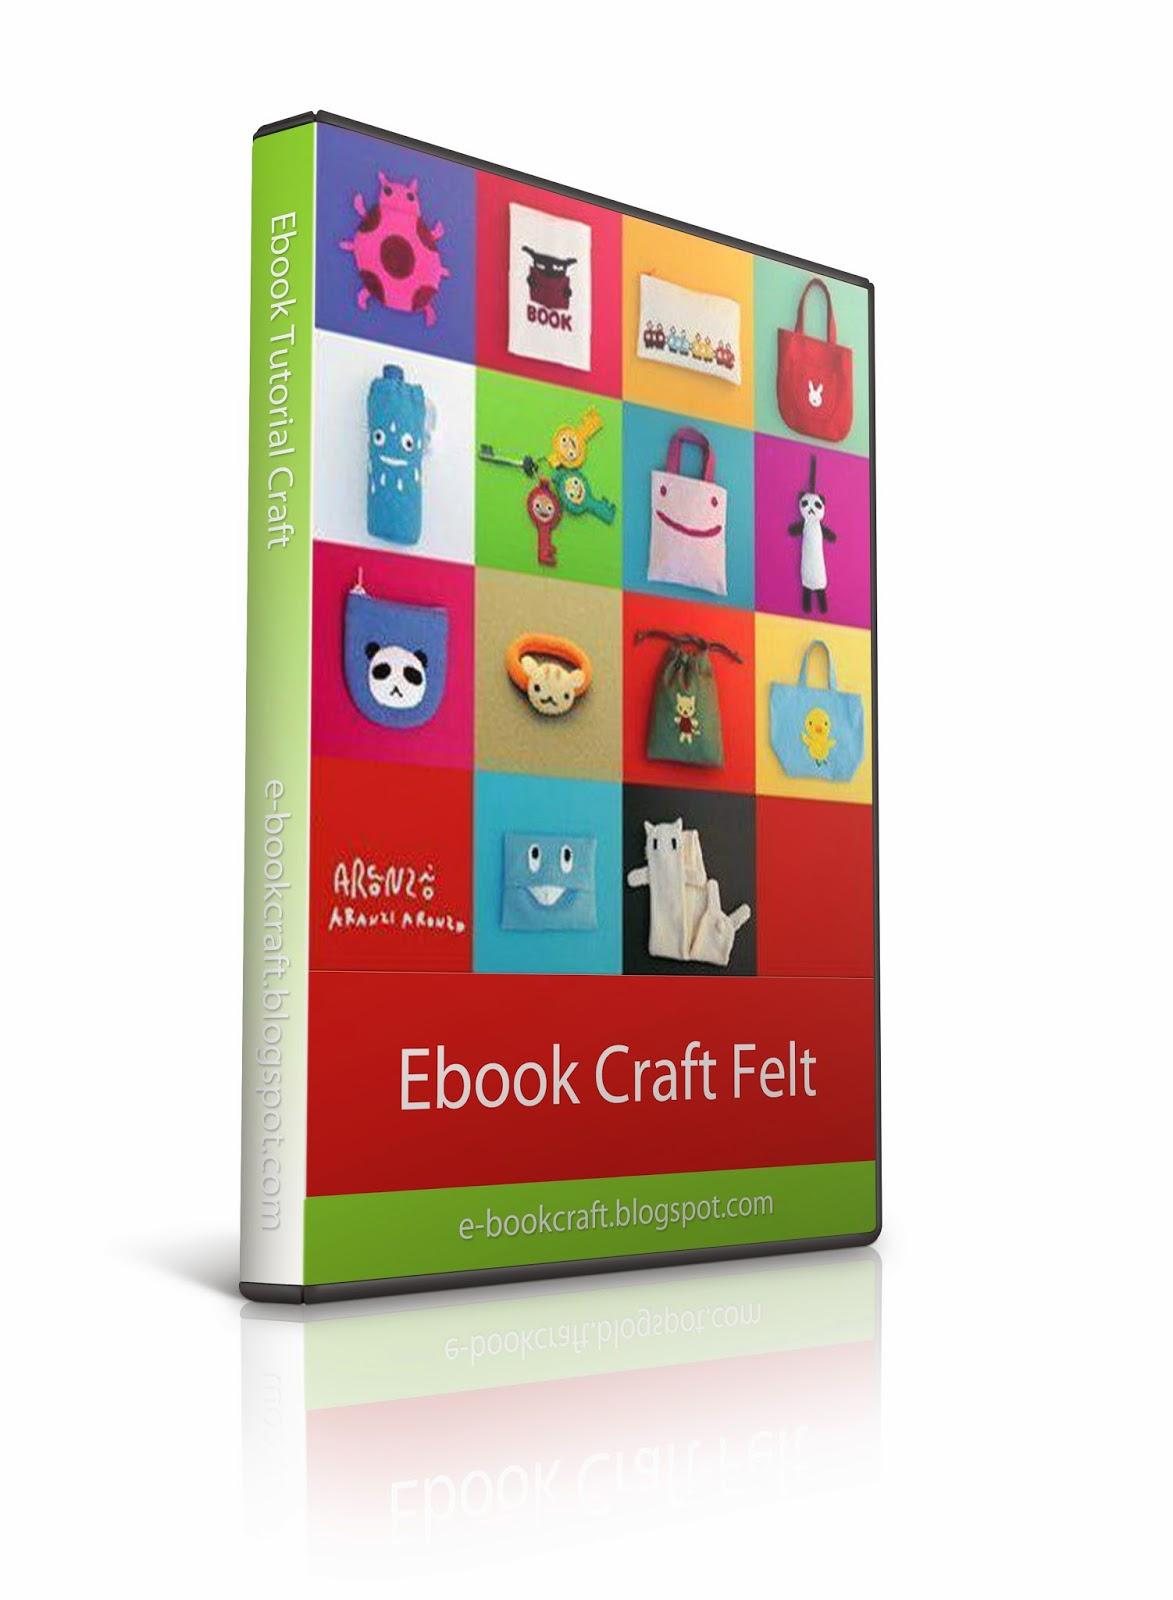 Ebook Craft Flanel, Ebook Kerajinan Tangan dari Flanel,